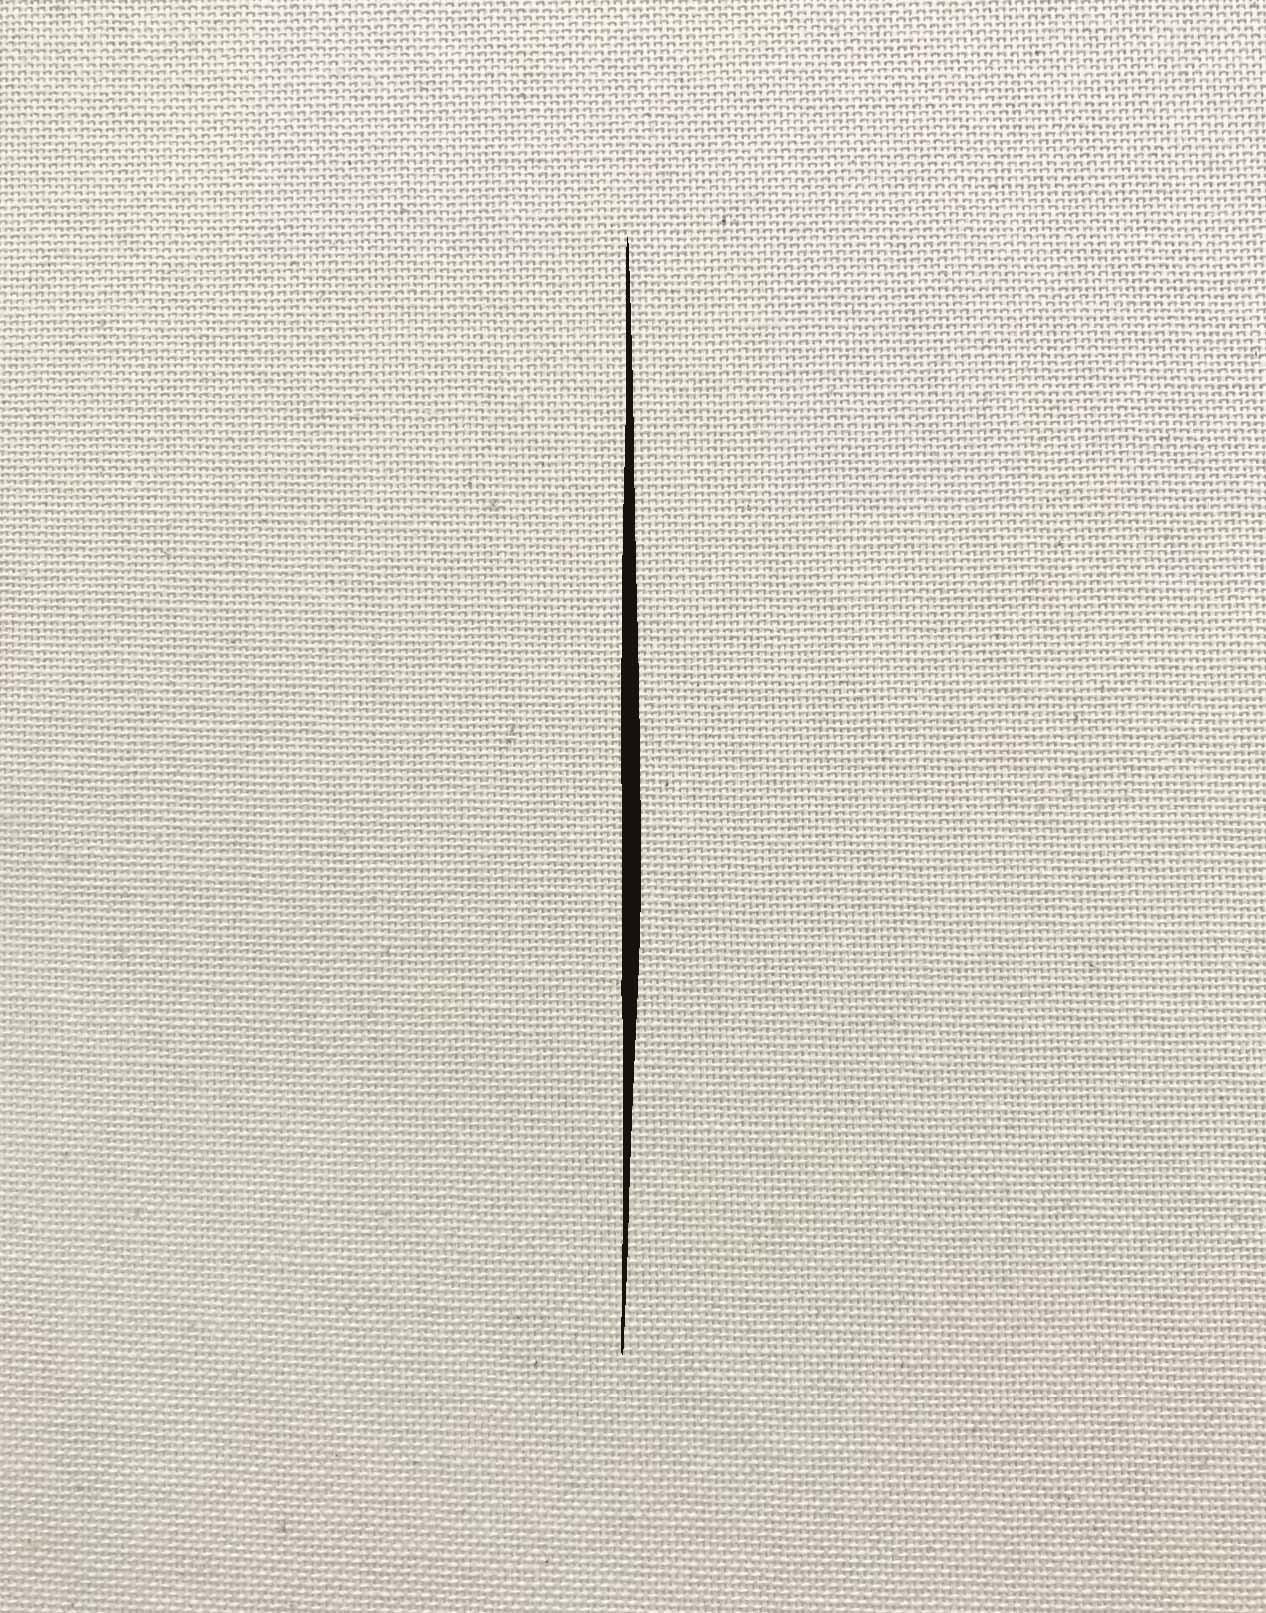 Lucio Fontana: On the Threshold